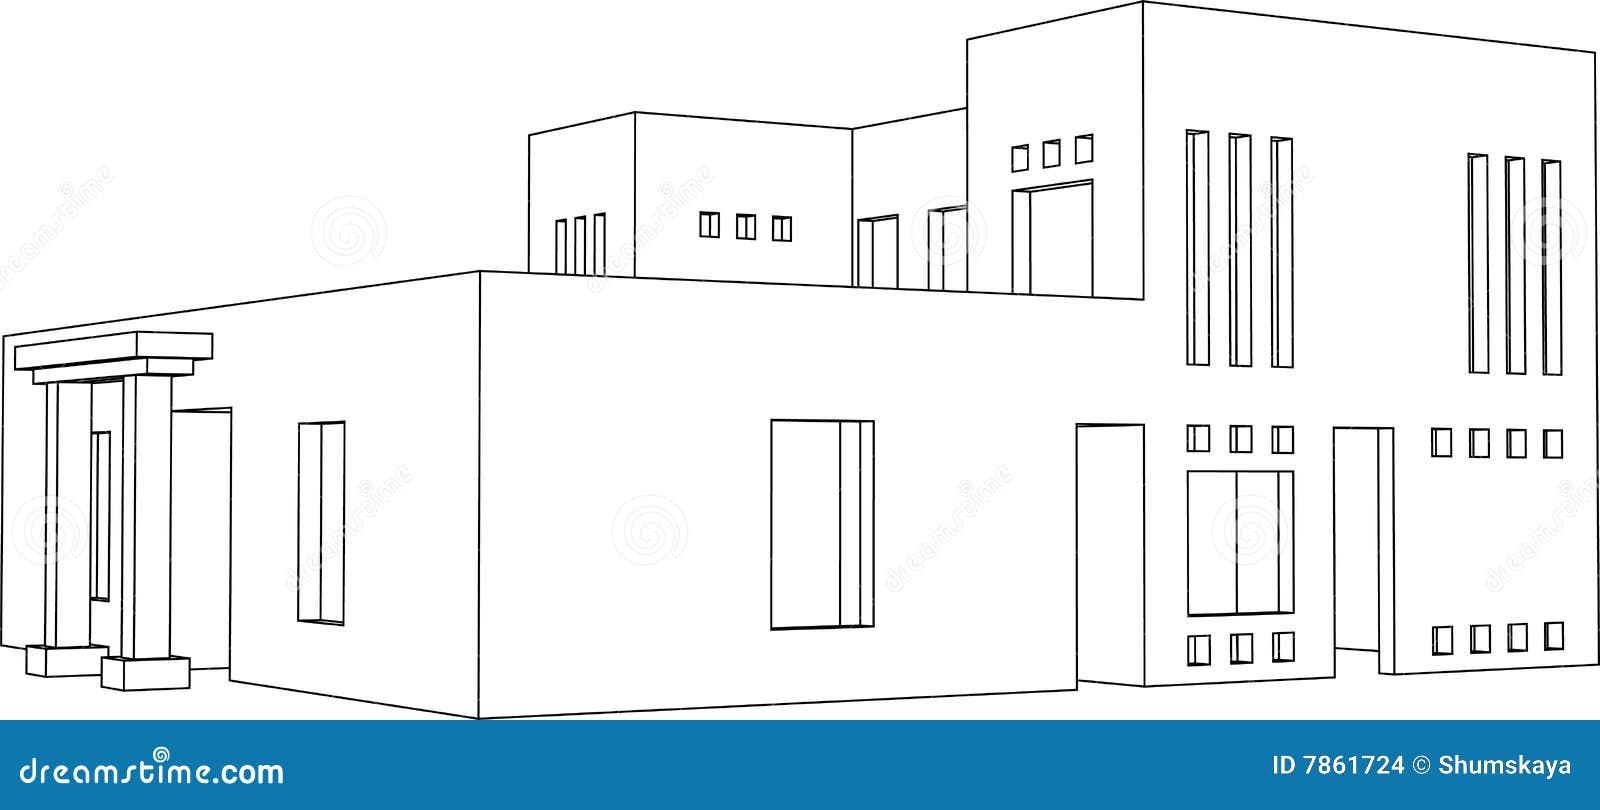 Haus-Perspektive 2